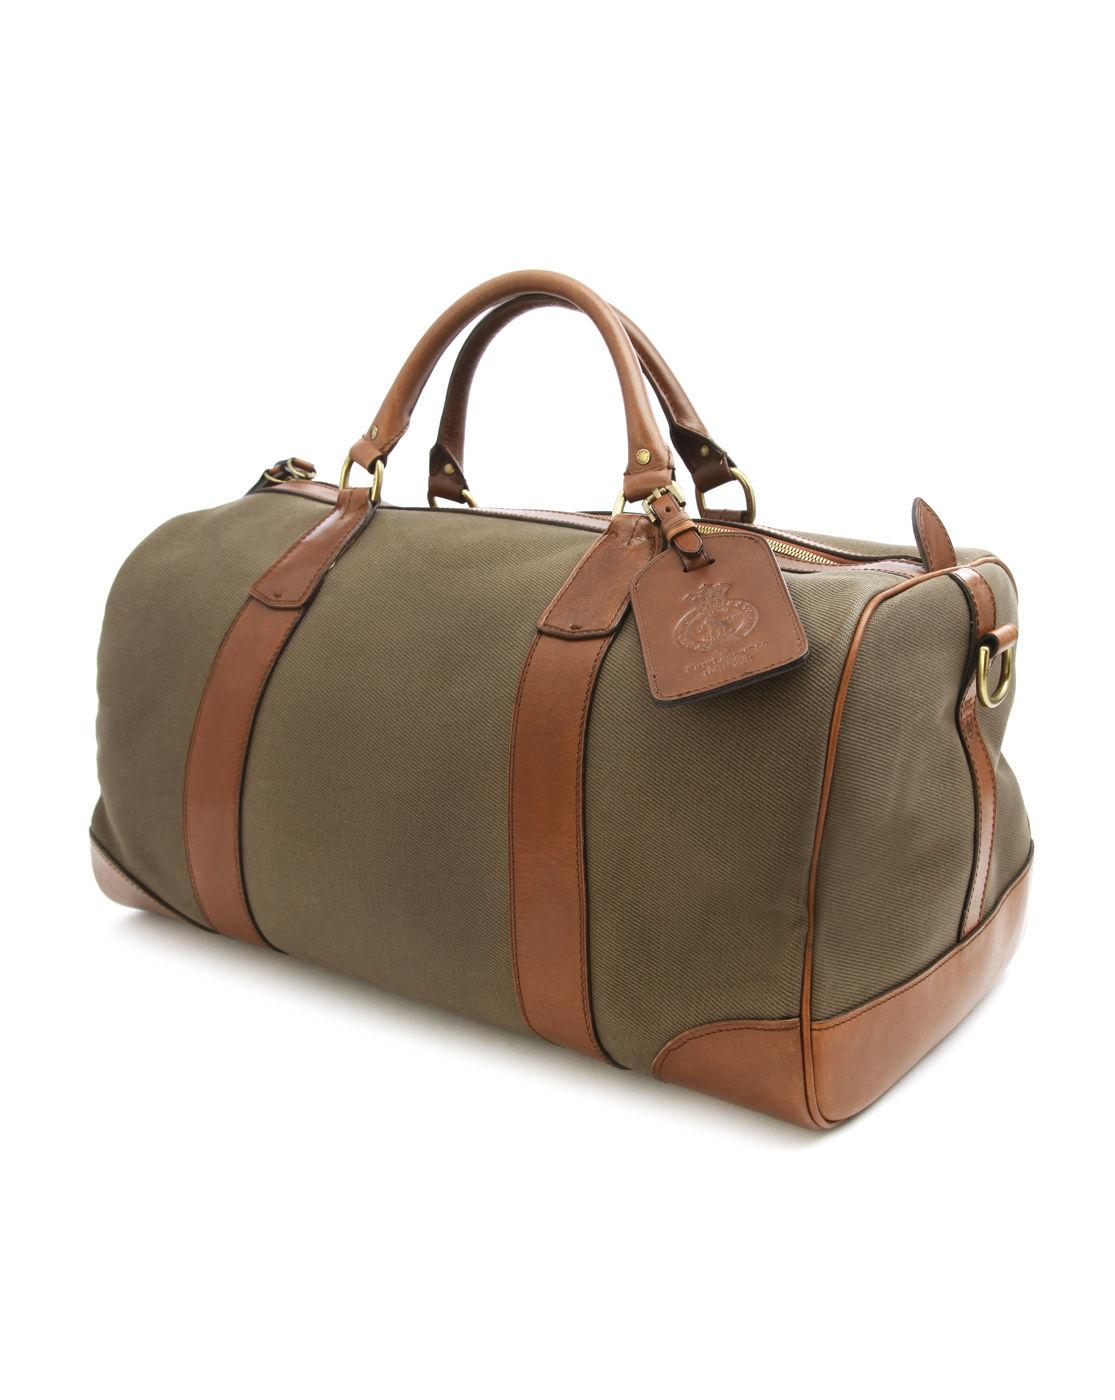 ralph lauren luggage repair | Euro Star Limos